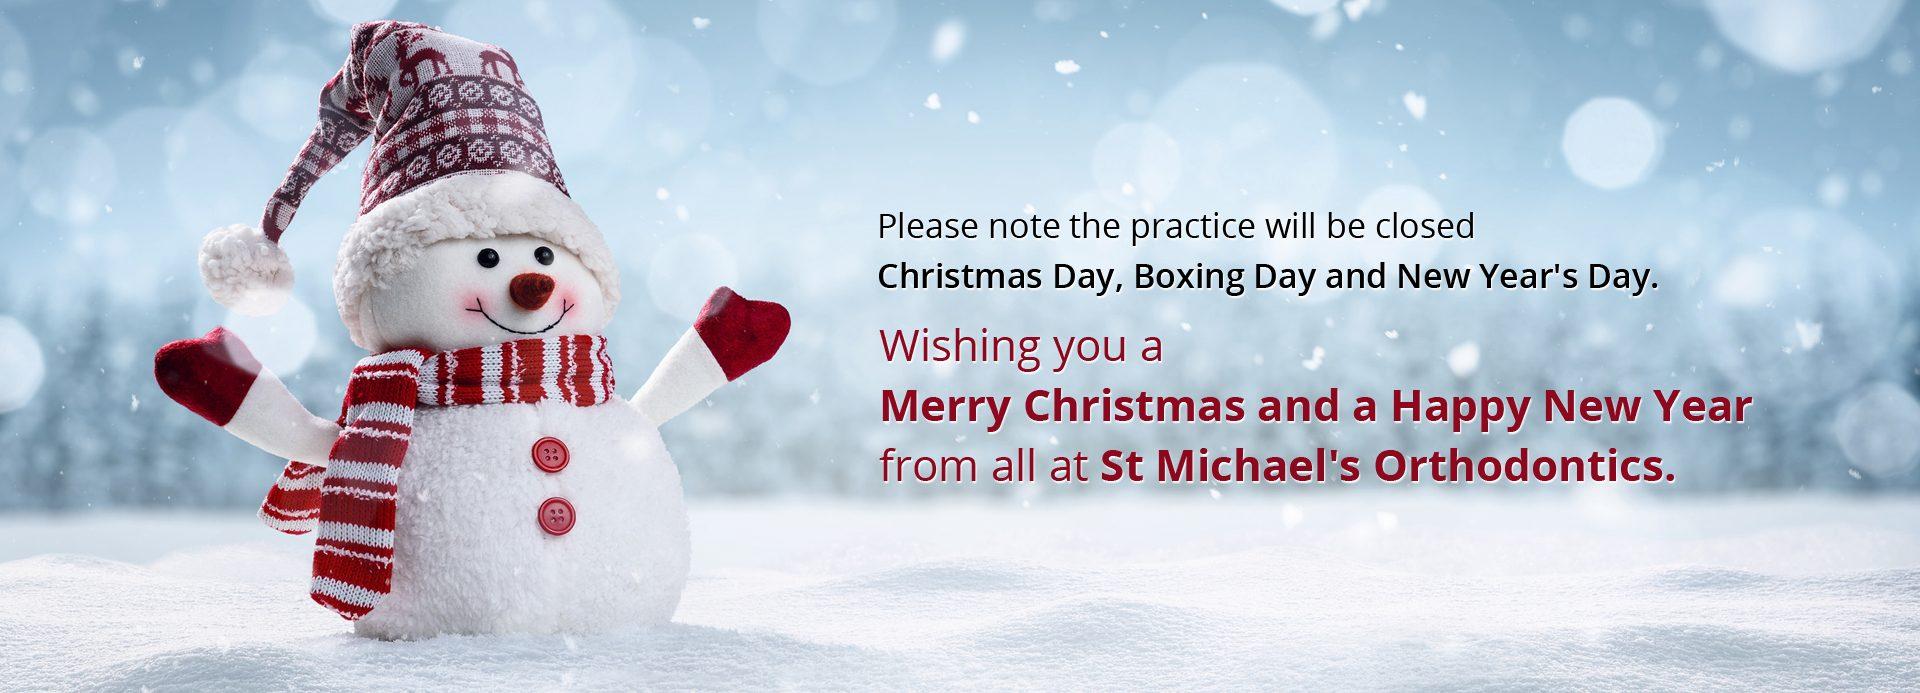 invisiblebraces yorkshire christmas